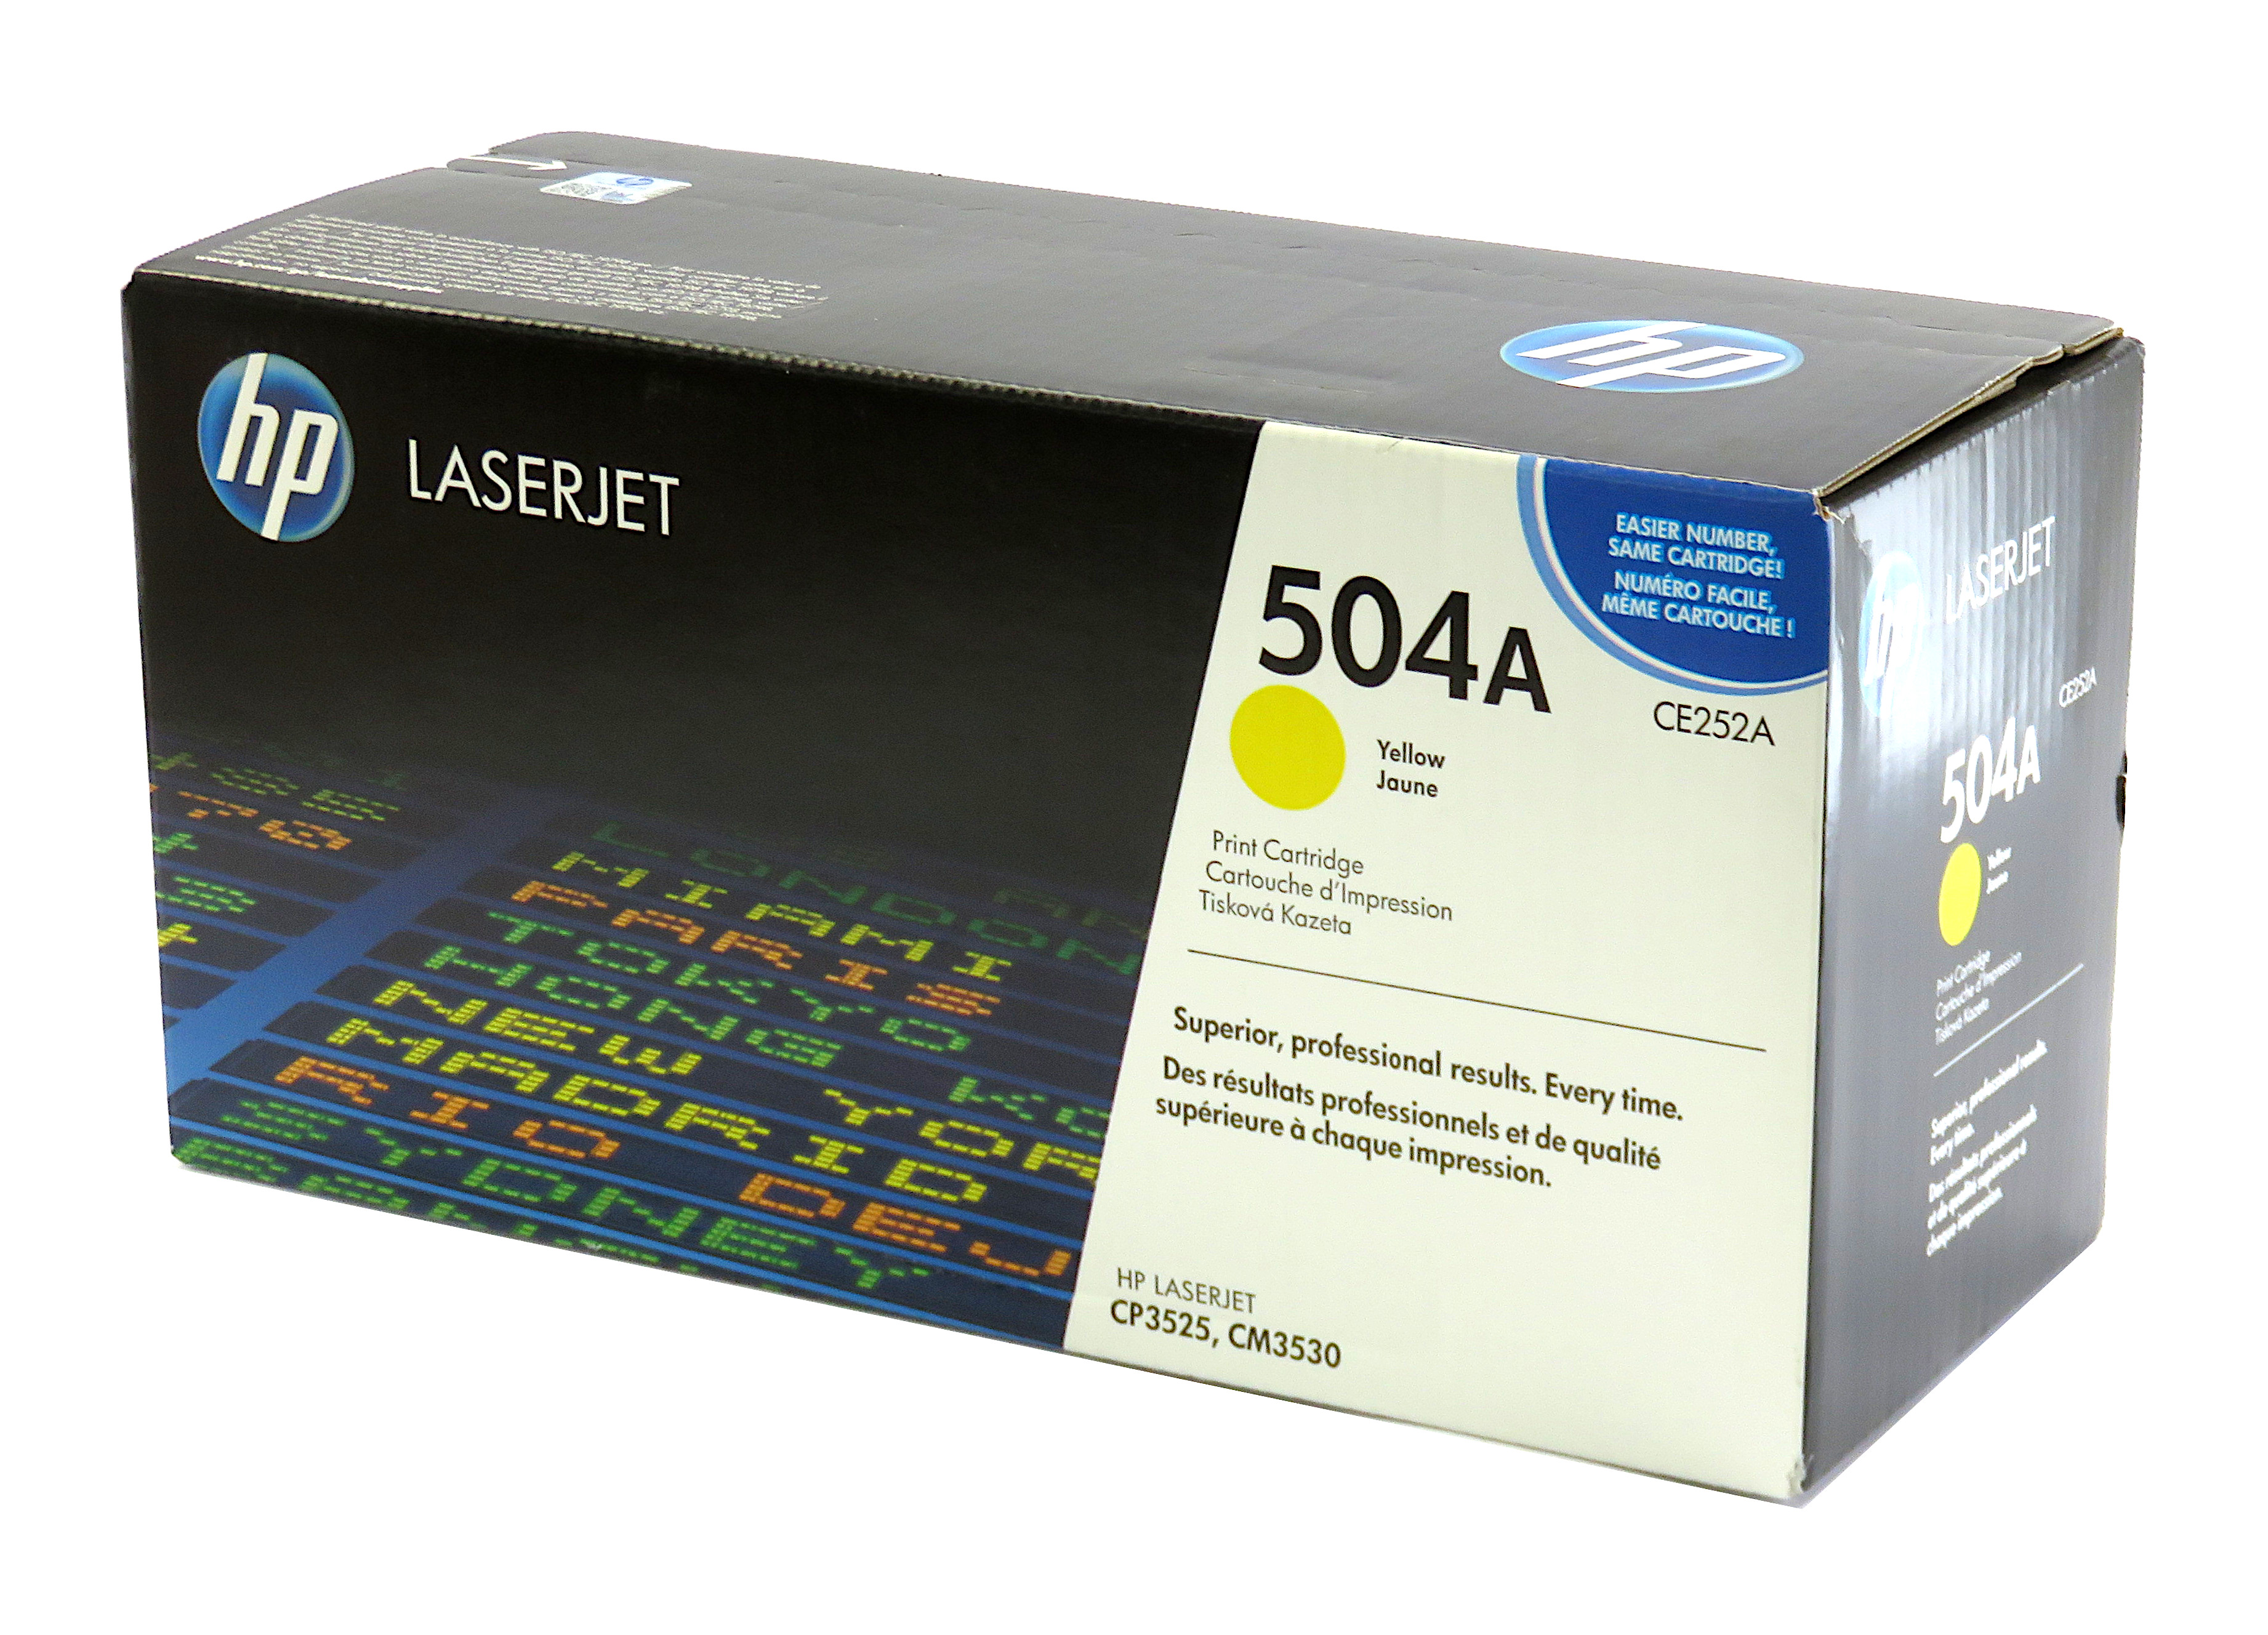 New Genuine HP LaserJet CE252A/504A Yellow Print Cartridge - Destinations Livery